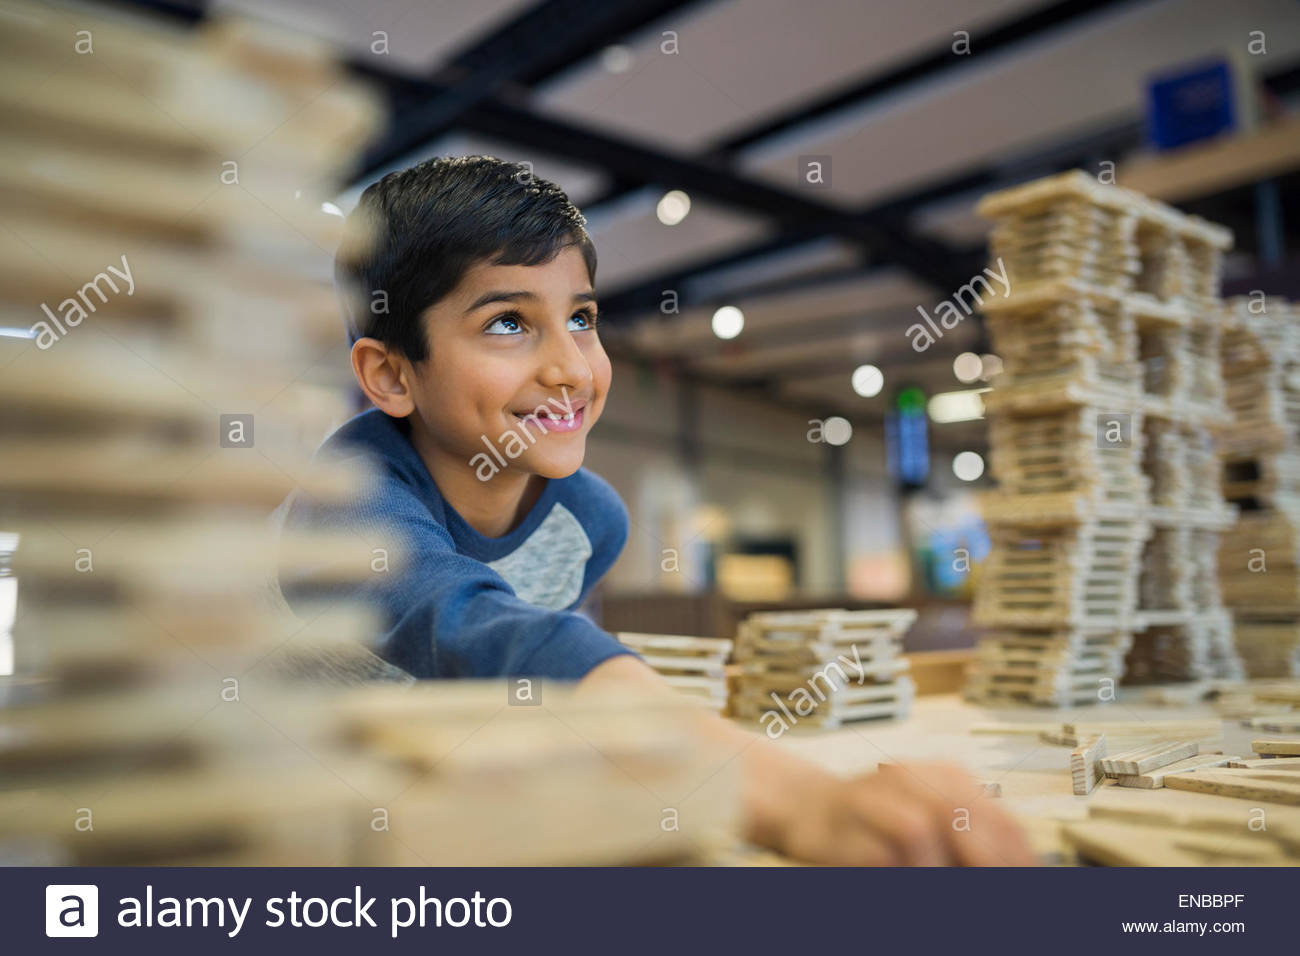 Montaje de estructura de bloques de madera Boy en science center Imagen De Stock